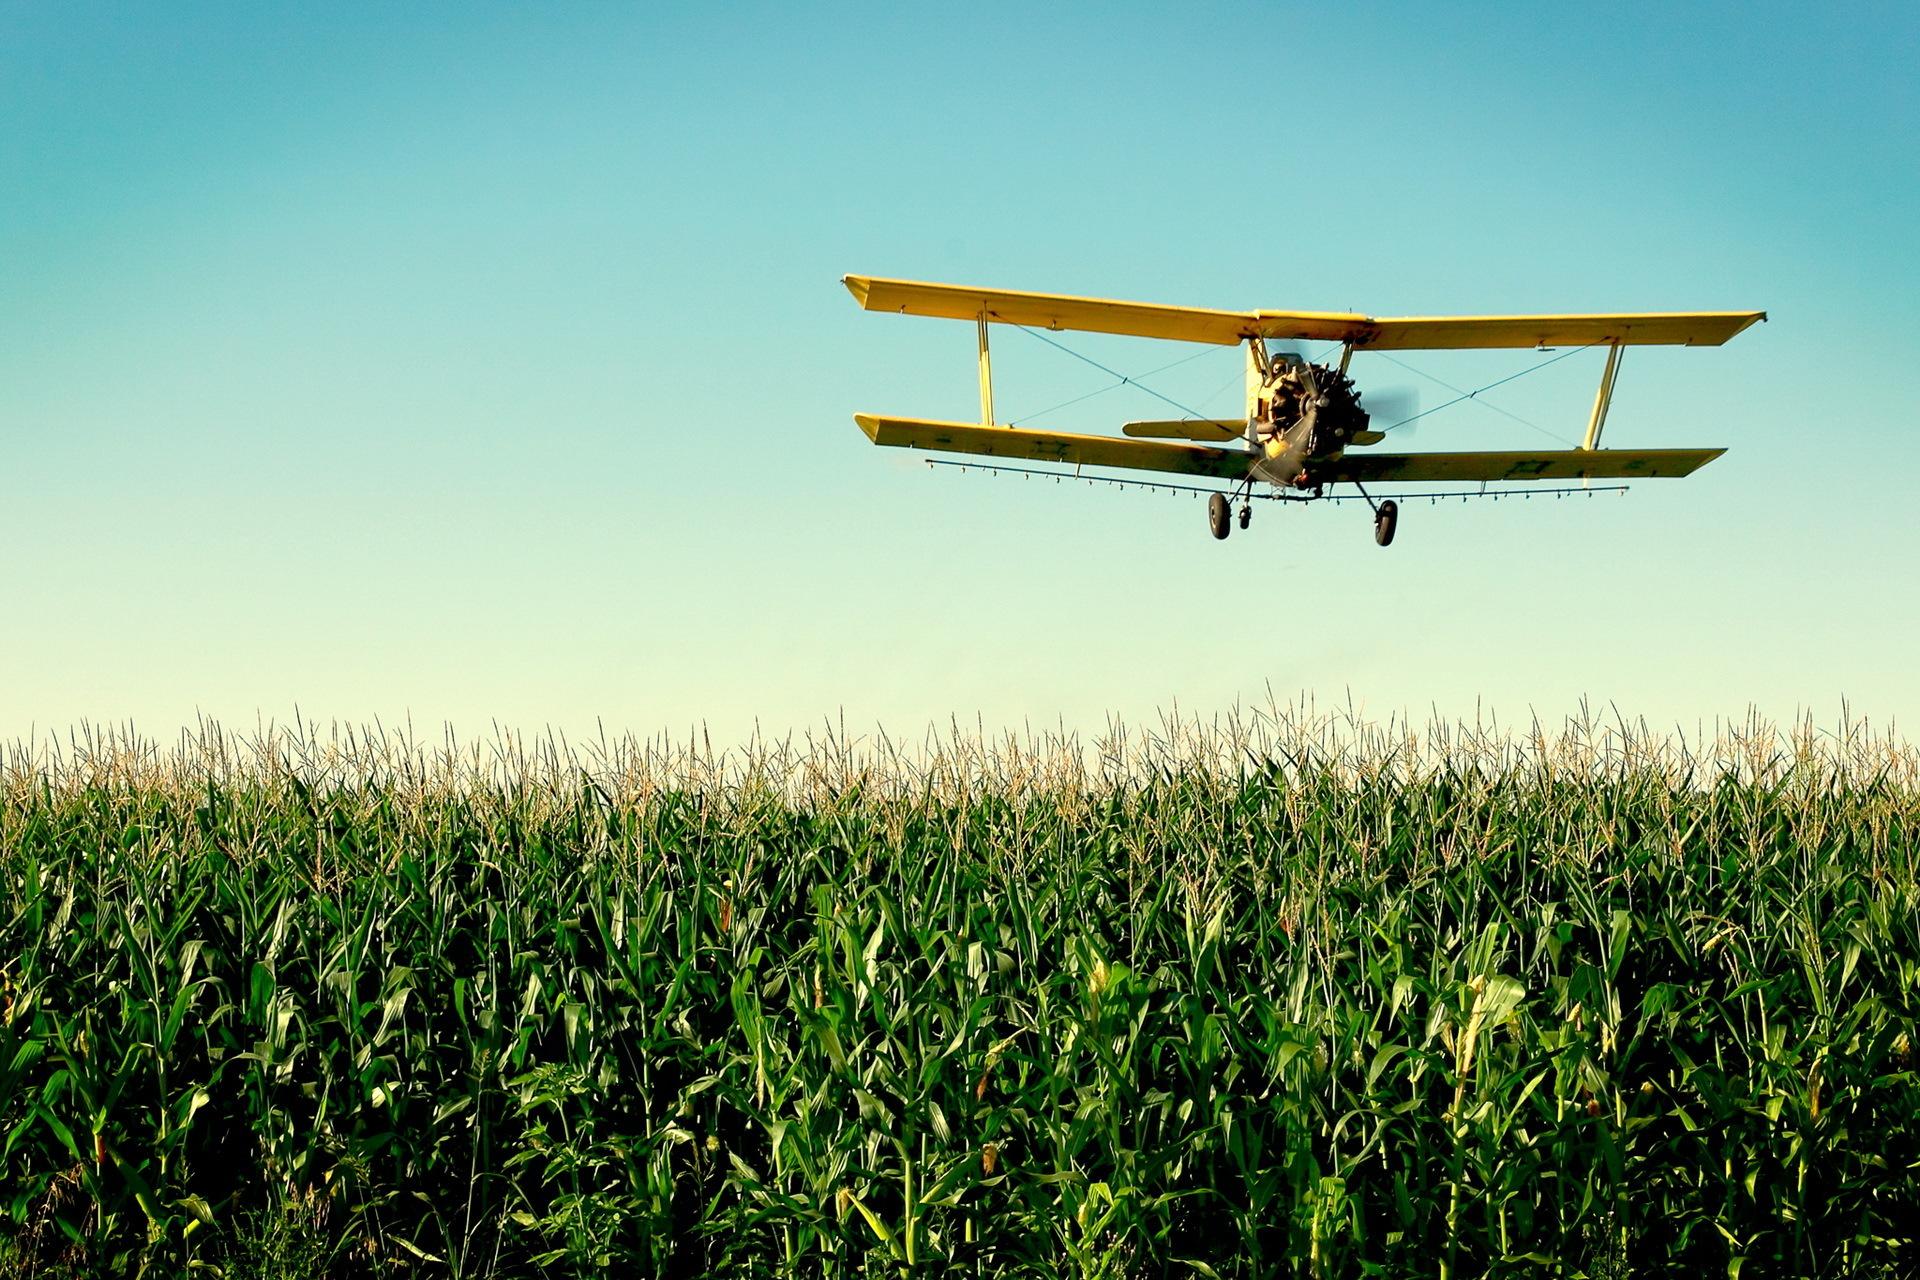 beautiful aircraft wallpaper view - photo #29